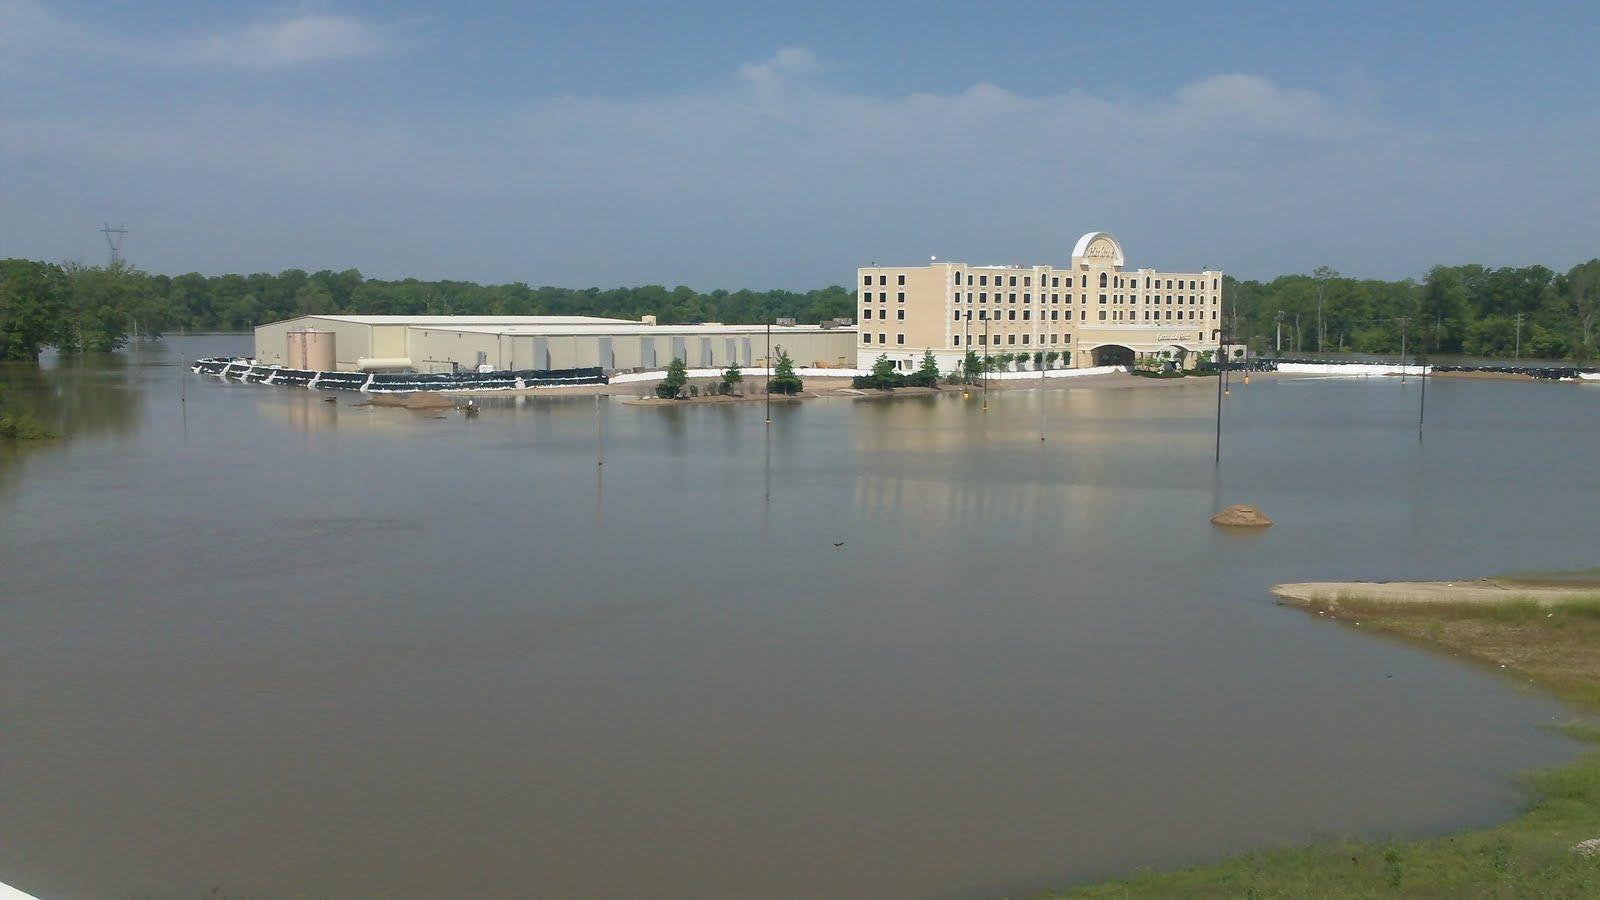 Greenville mississippi casino hotels